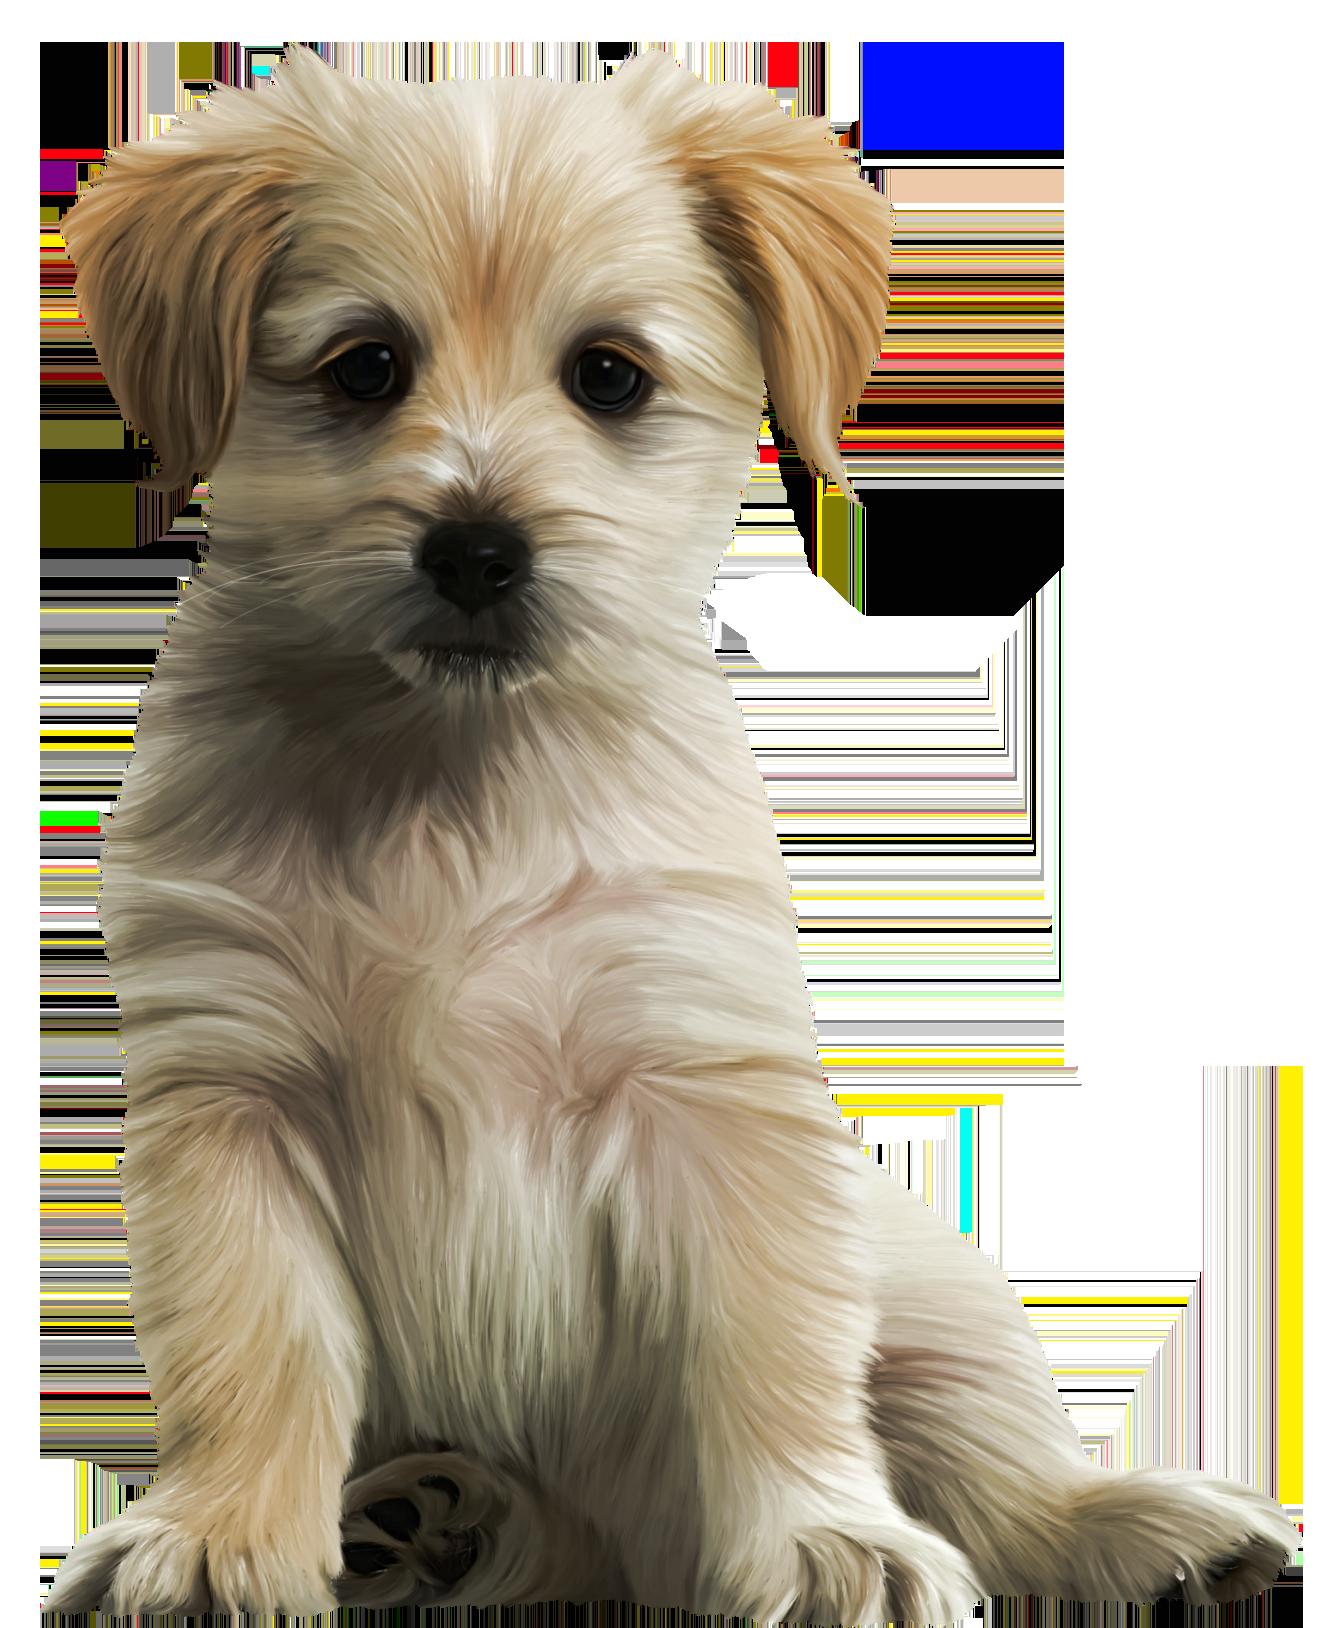 Cute puppy png image. Pet clipart companion